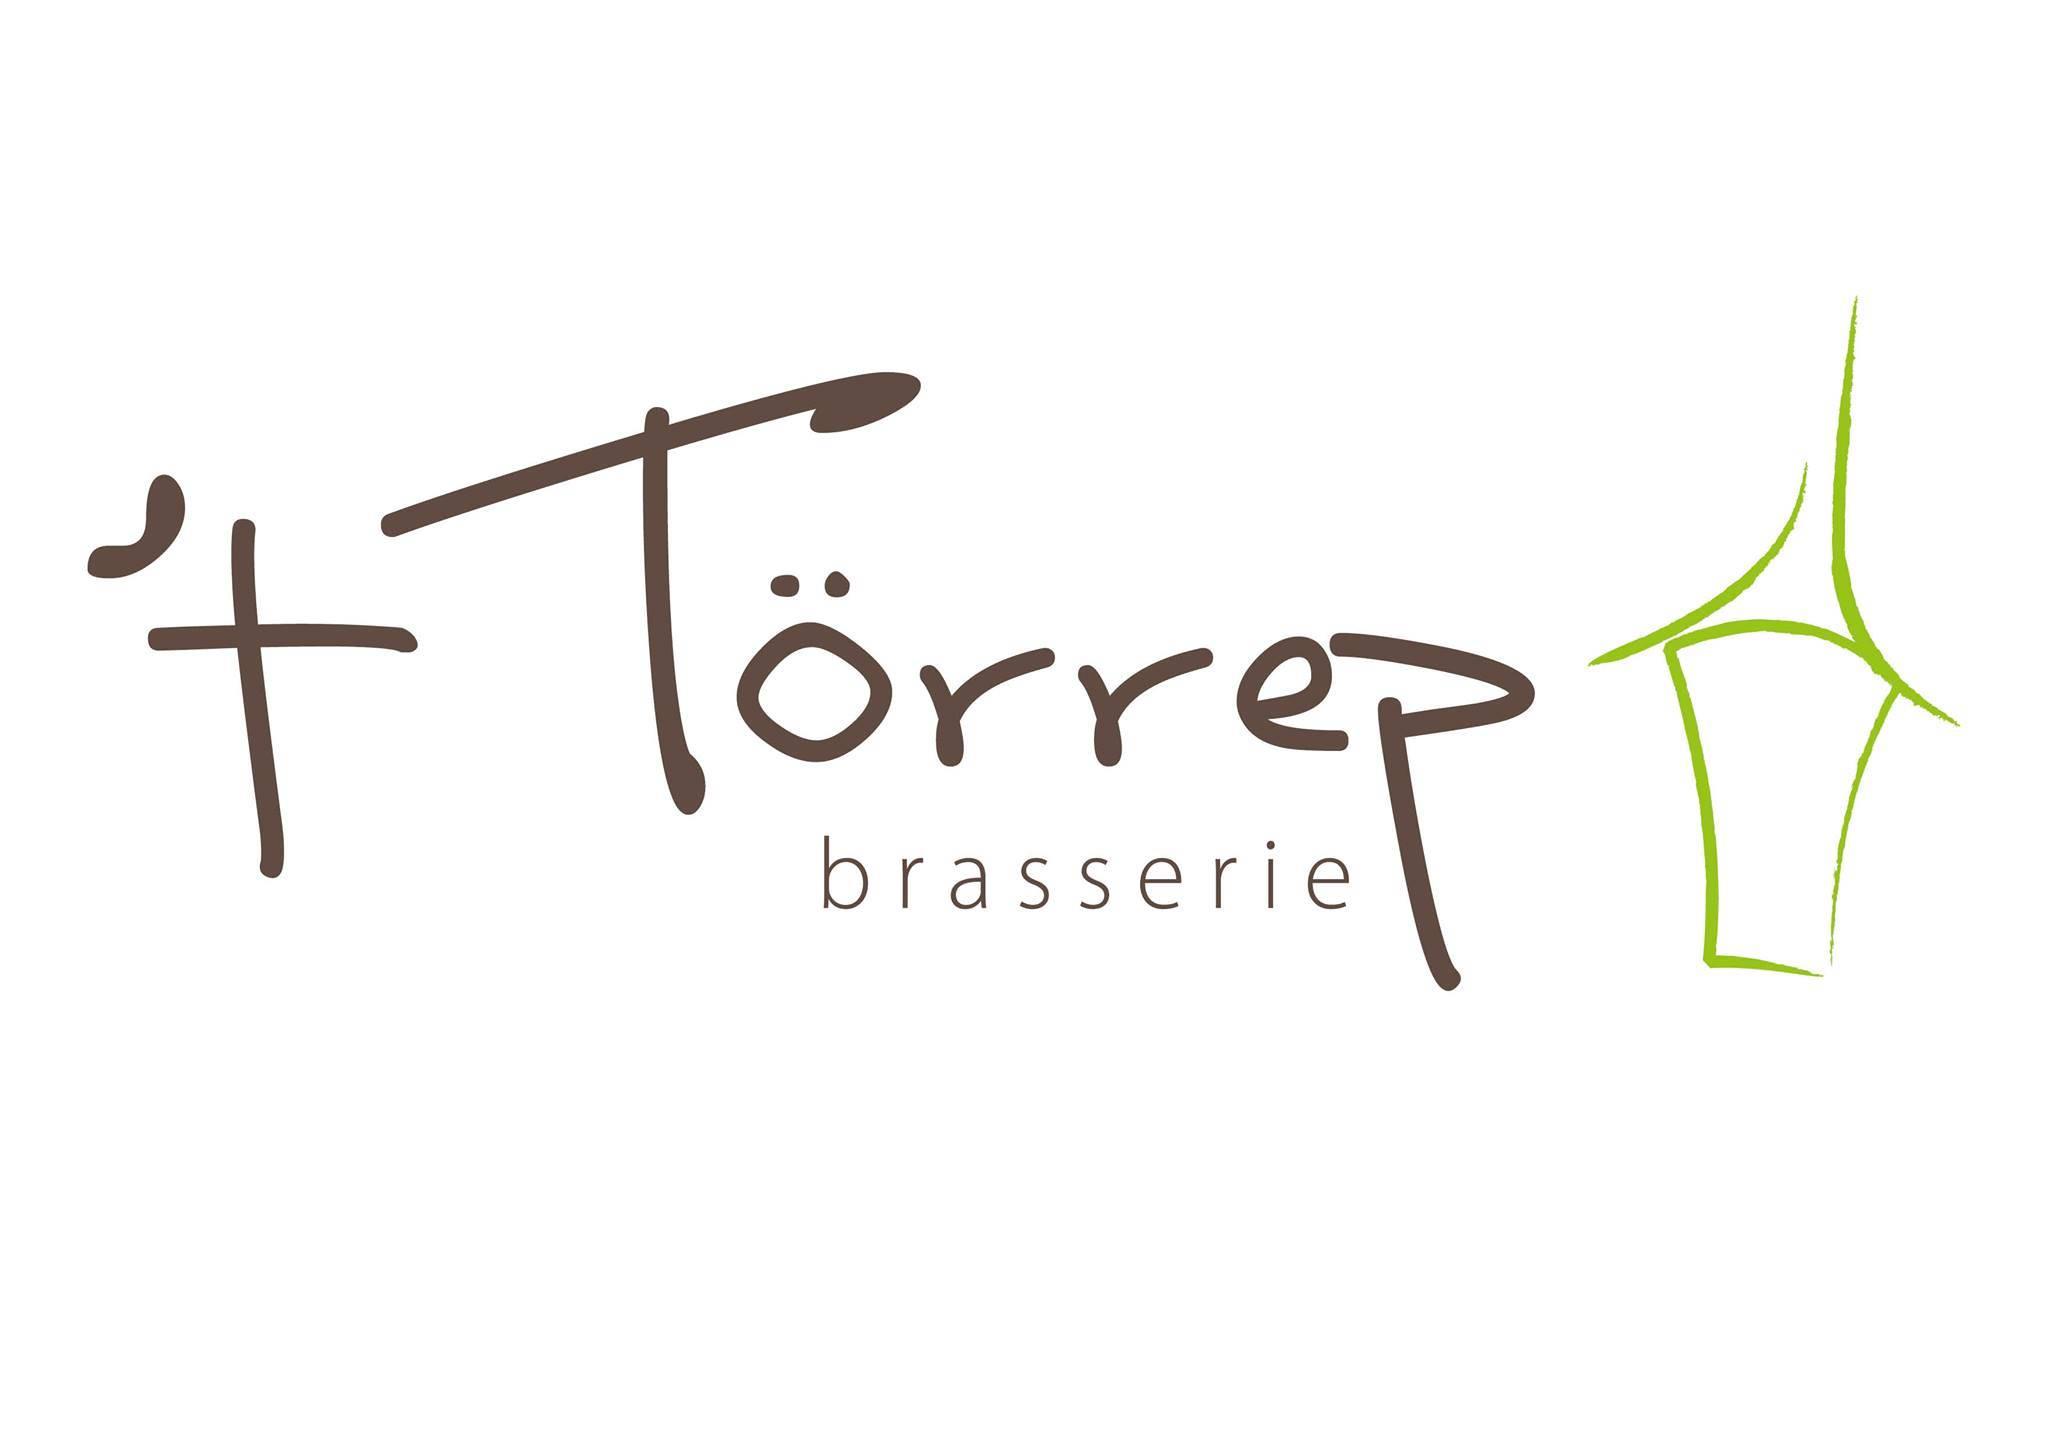 Brasserie 't Törrep